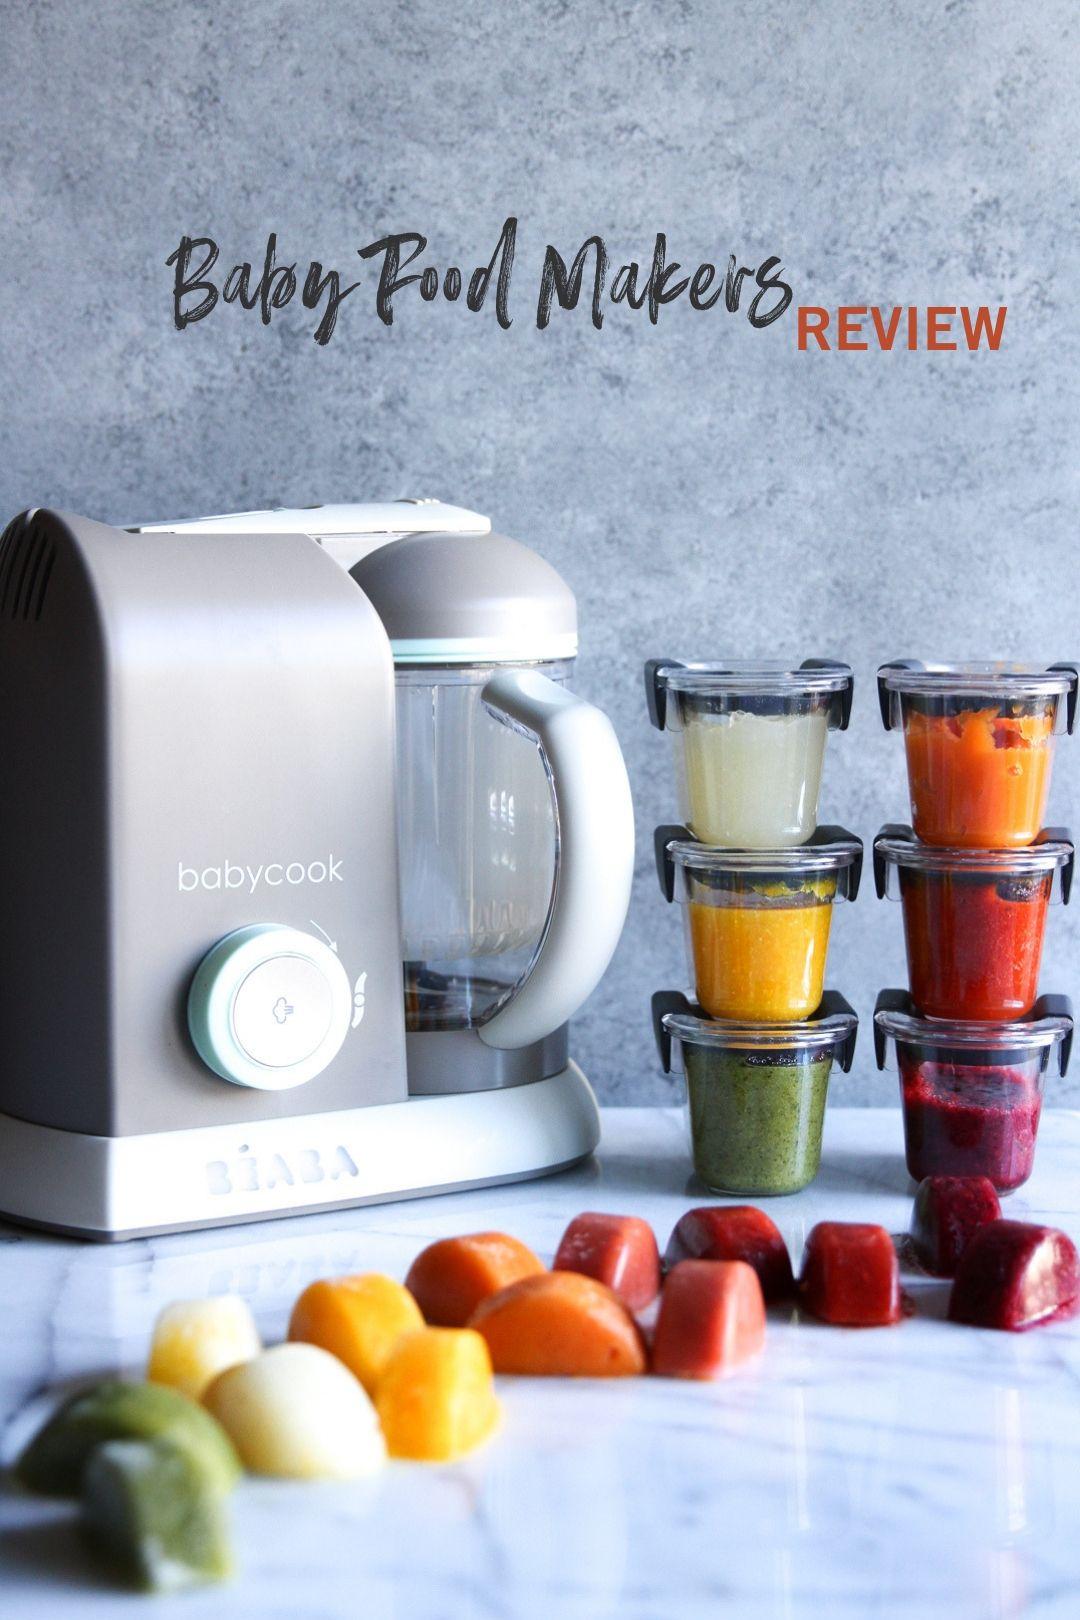 Baby food makers review baby food makers baby food